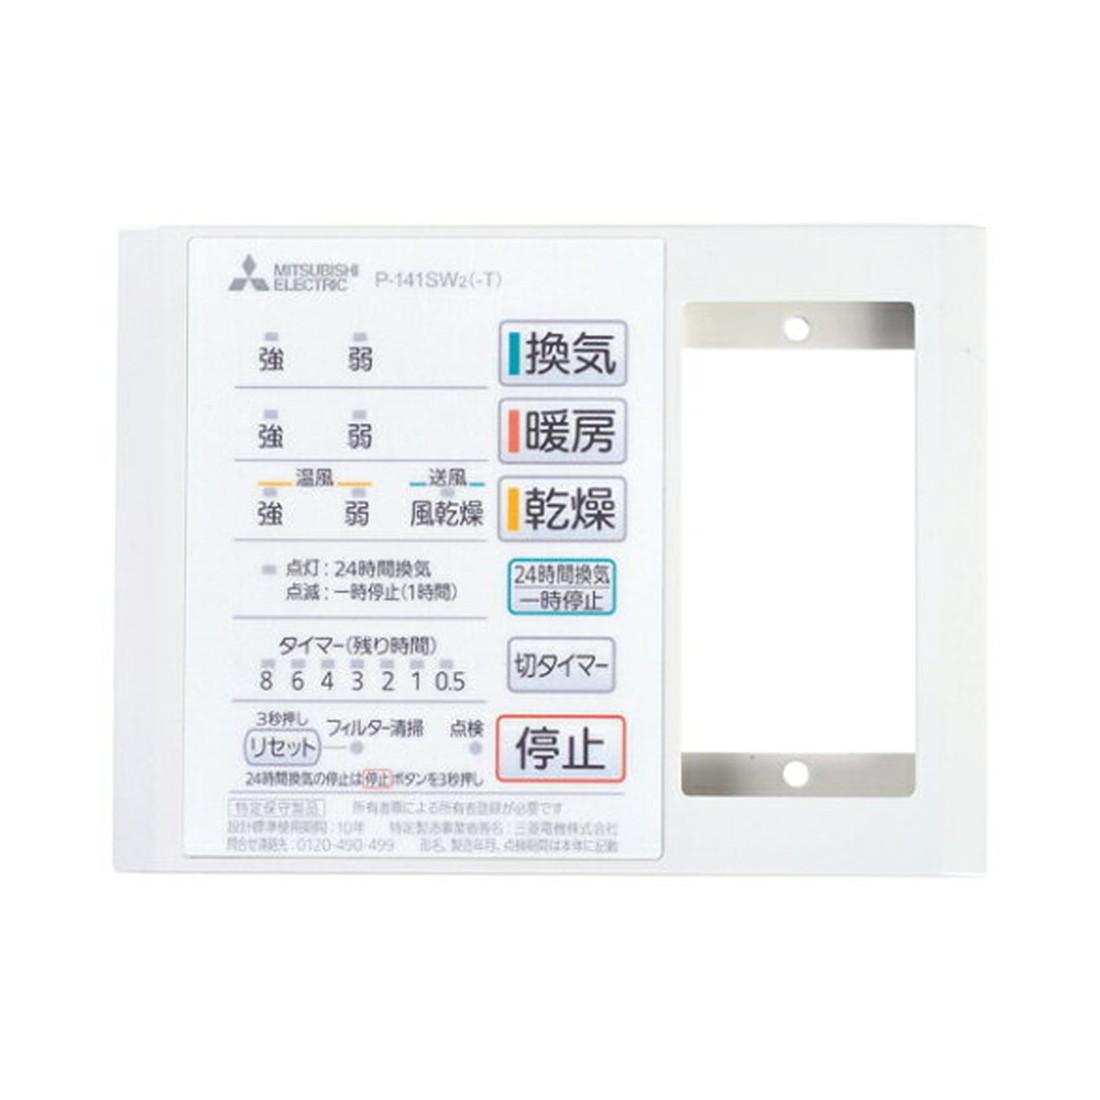 【P-141SW2-T】浴室暖房乾燥機用リモコン